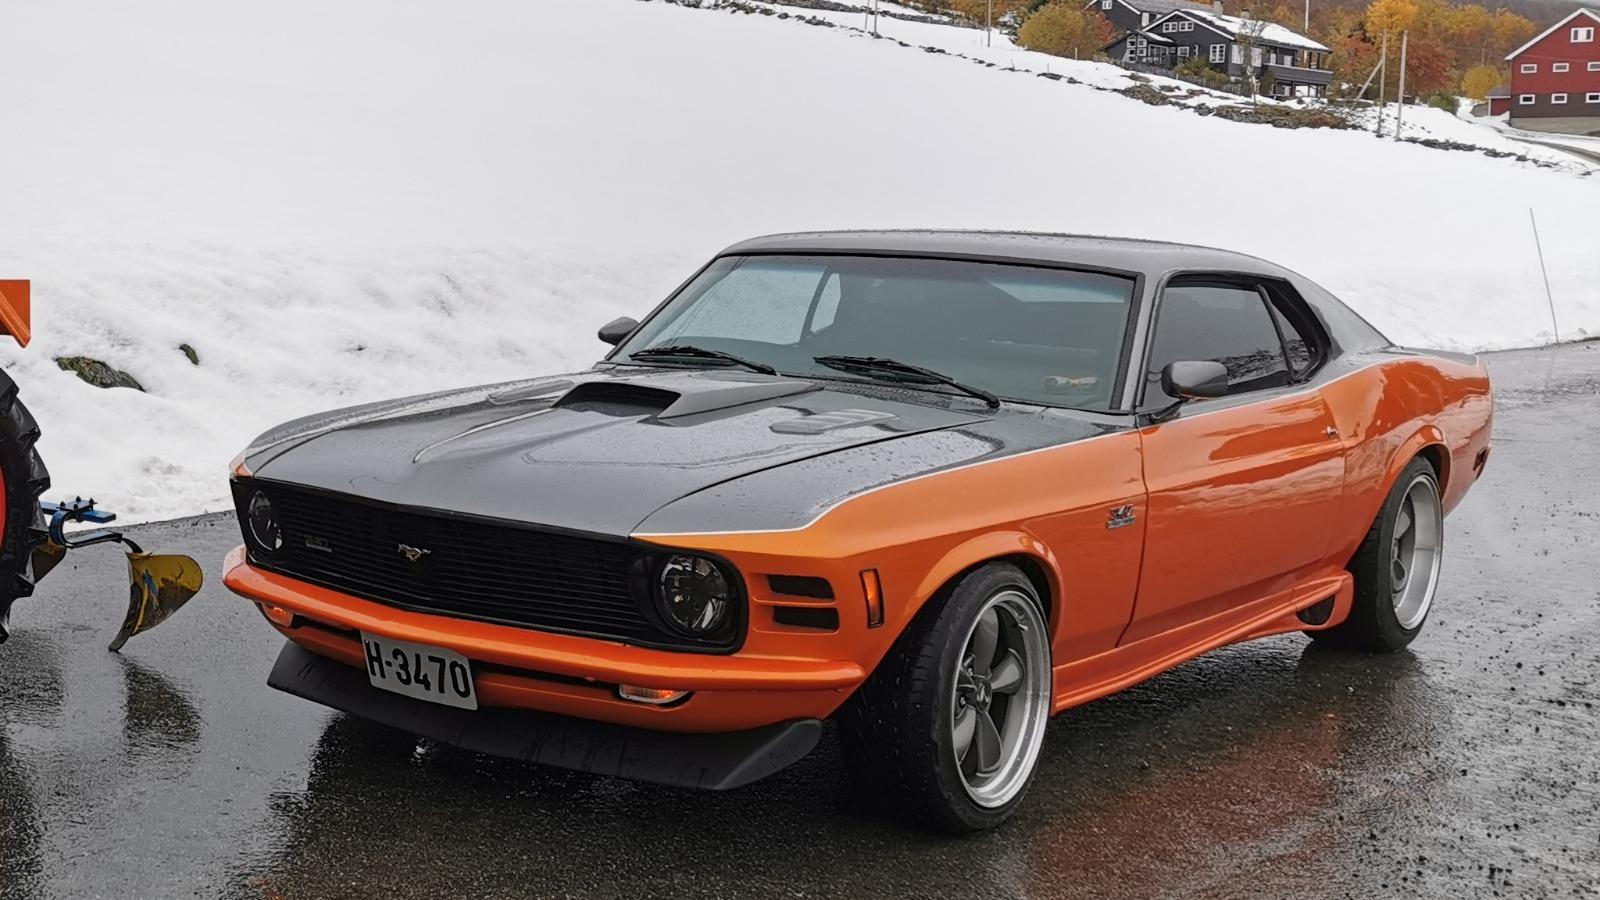 Ukas bil – 1970 Ford Mustang SportsRoof.